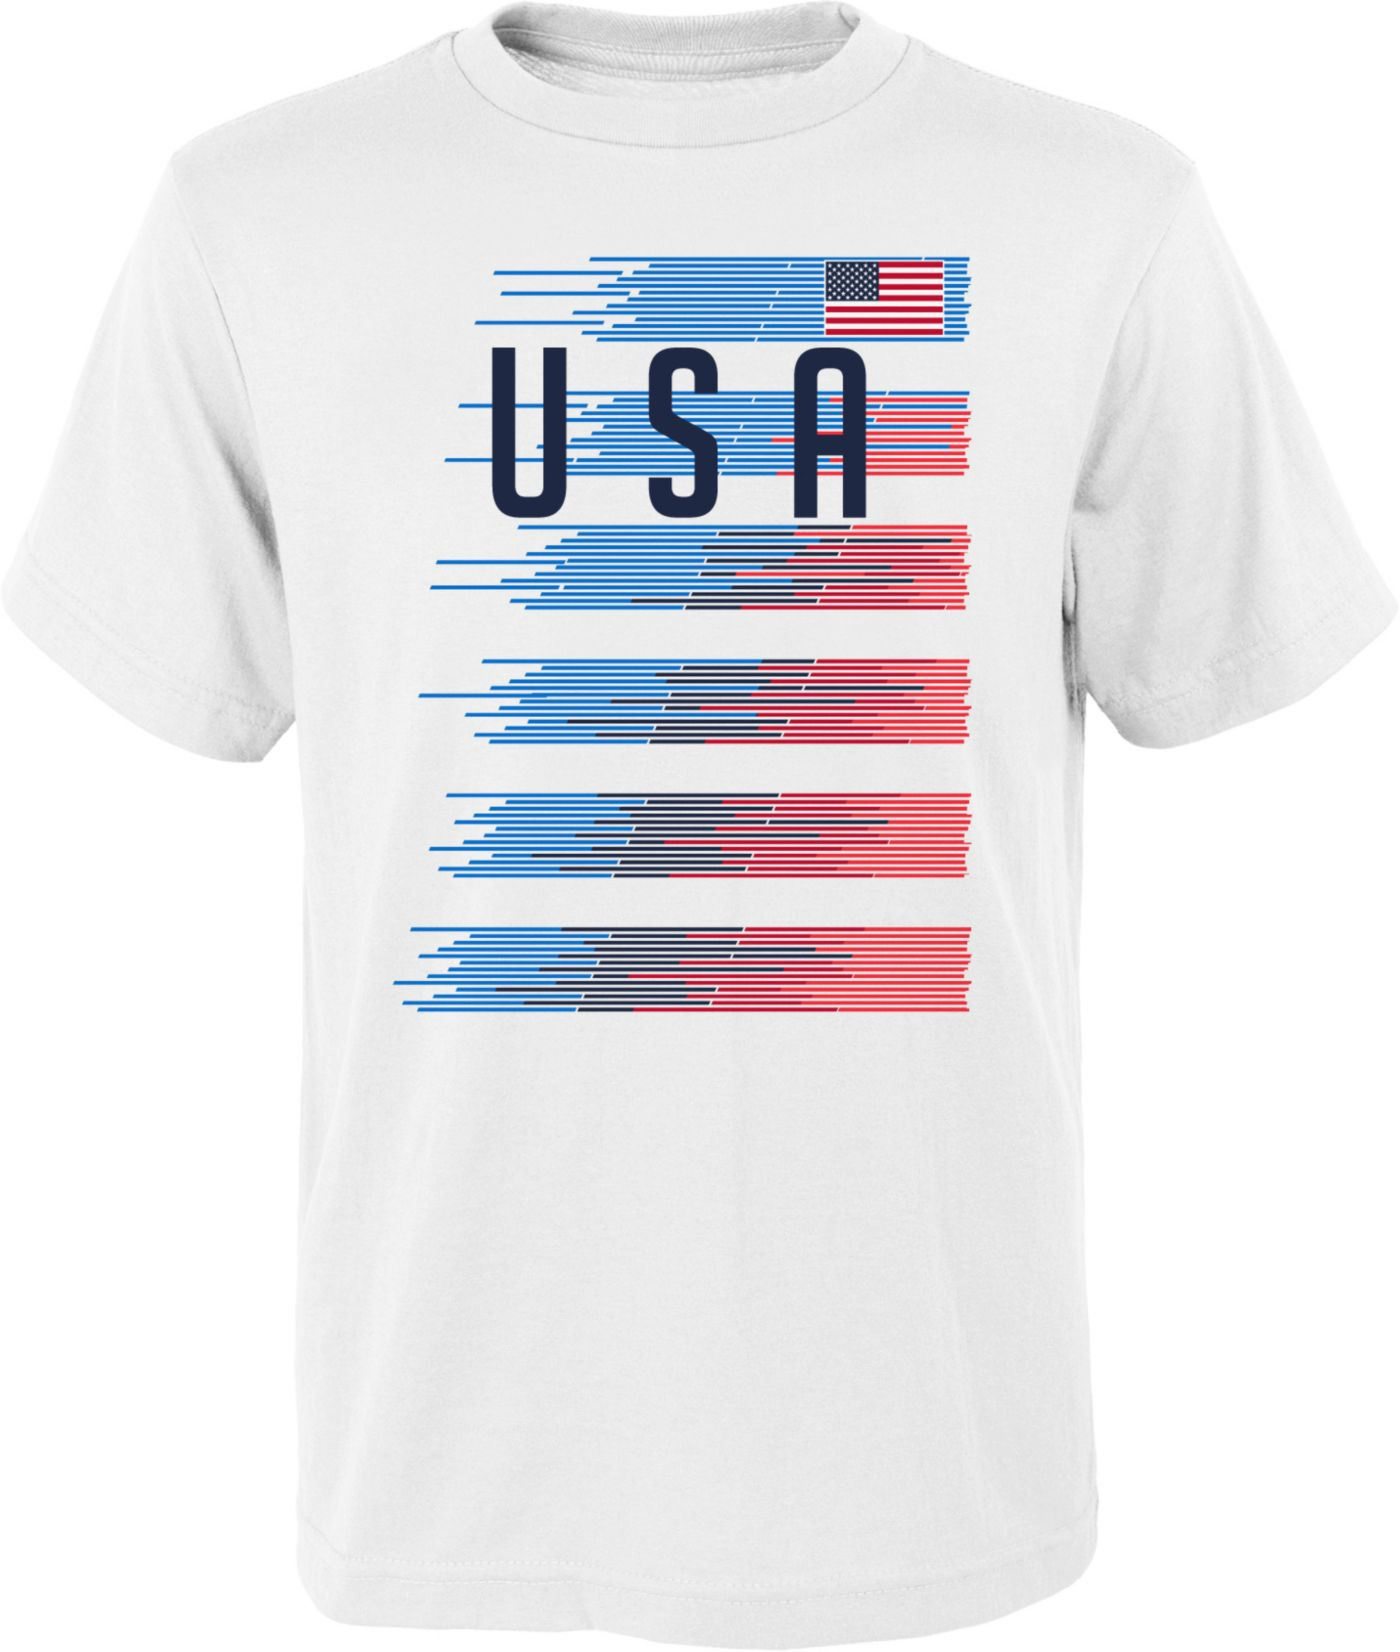 Outerstuff Men's USA Soccer One Team White T-Shirt